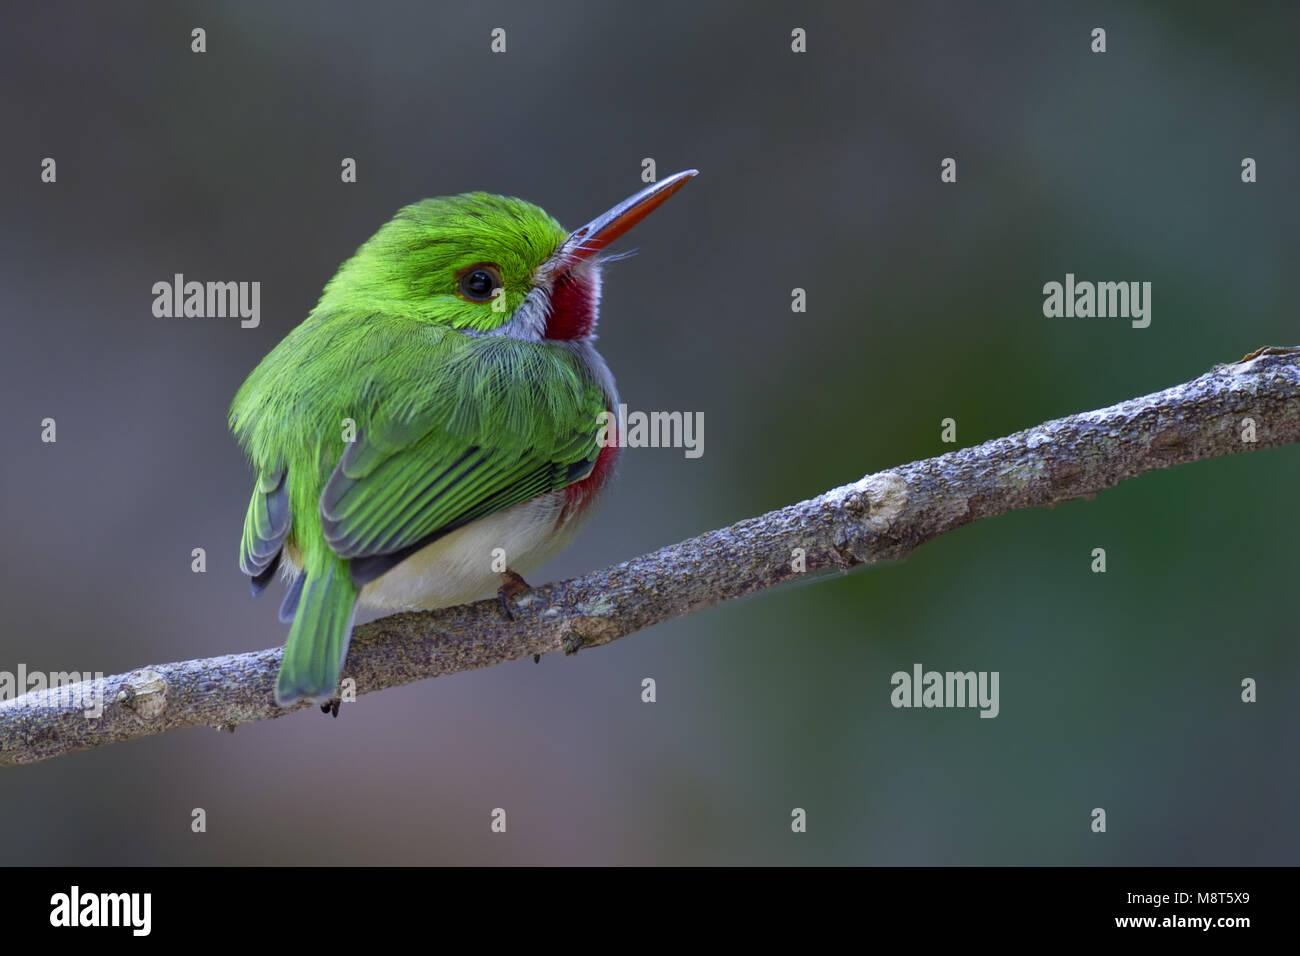 Diksnaveltodie, Broad-billed Tody - Stock Image